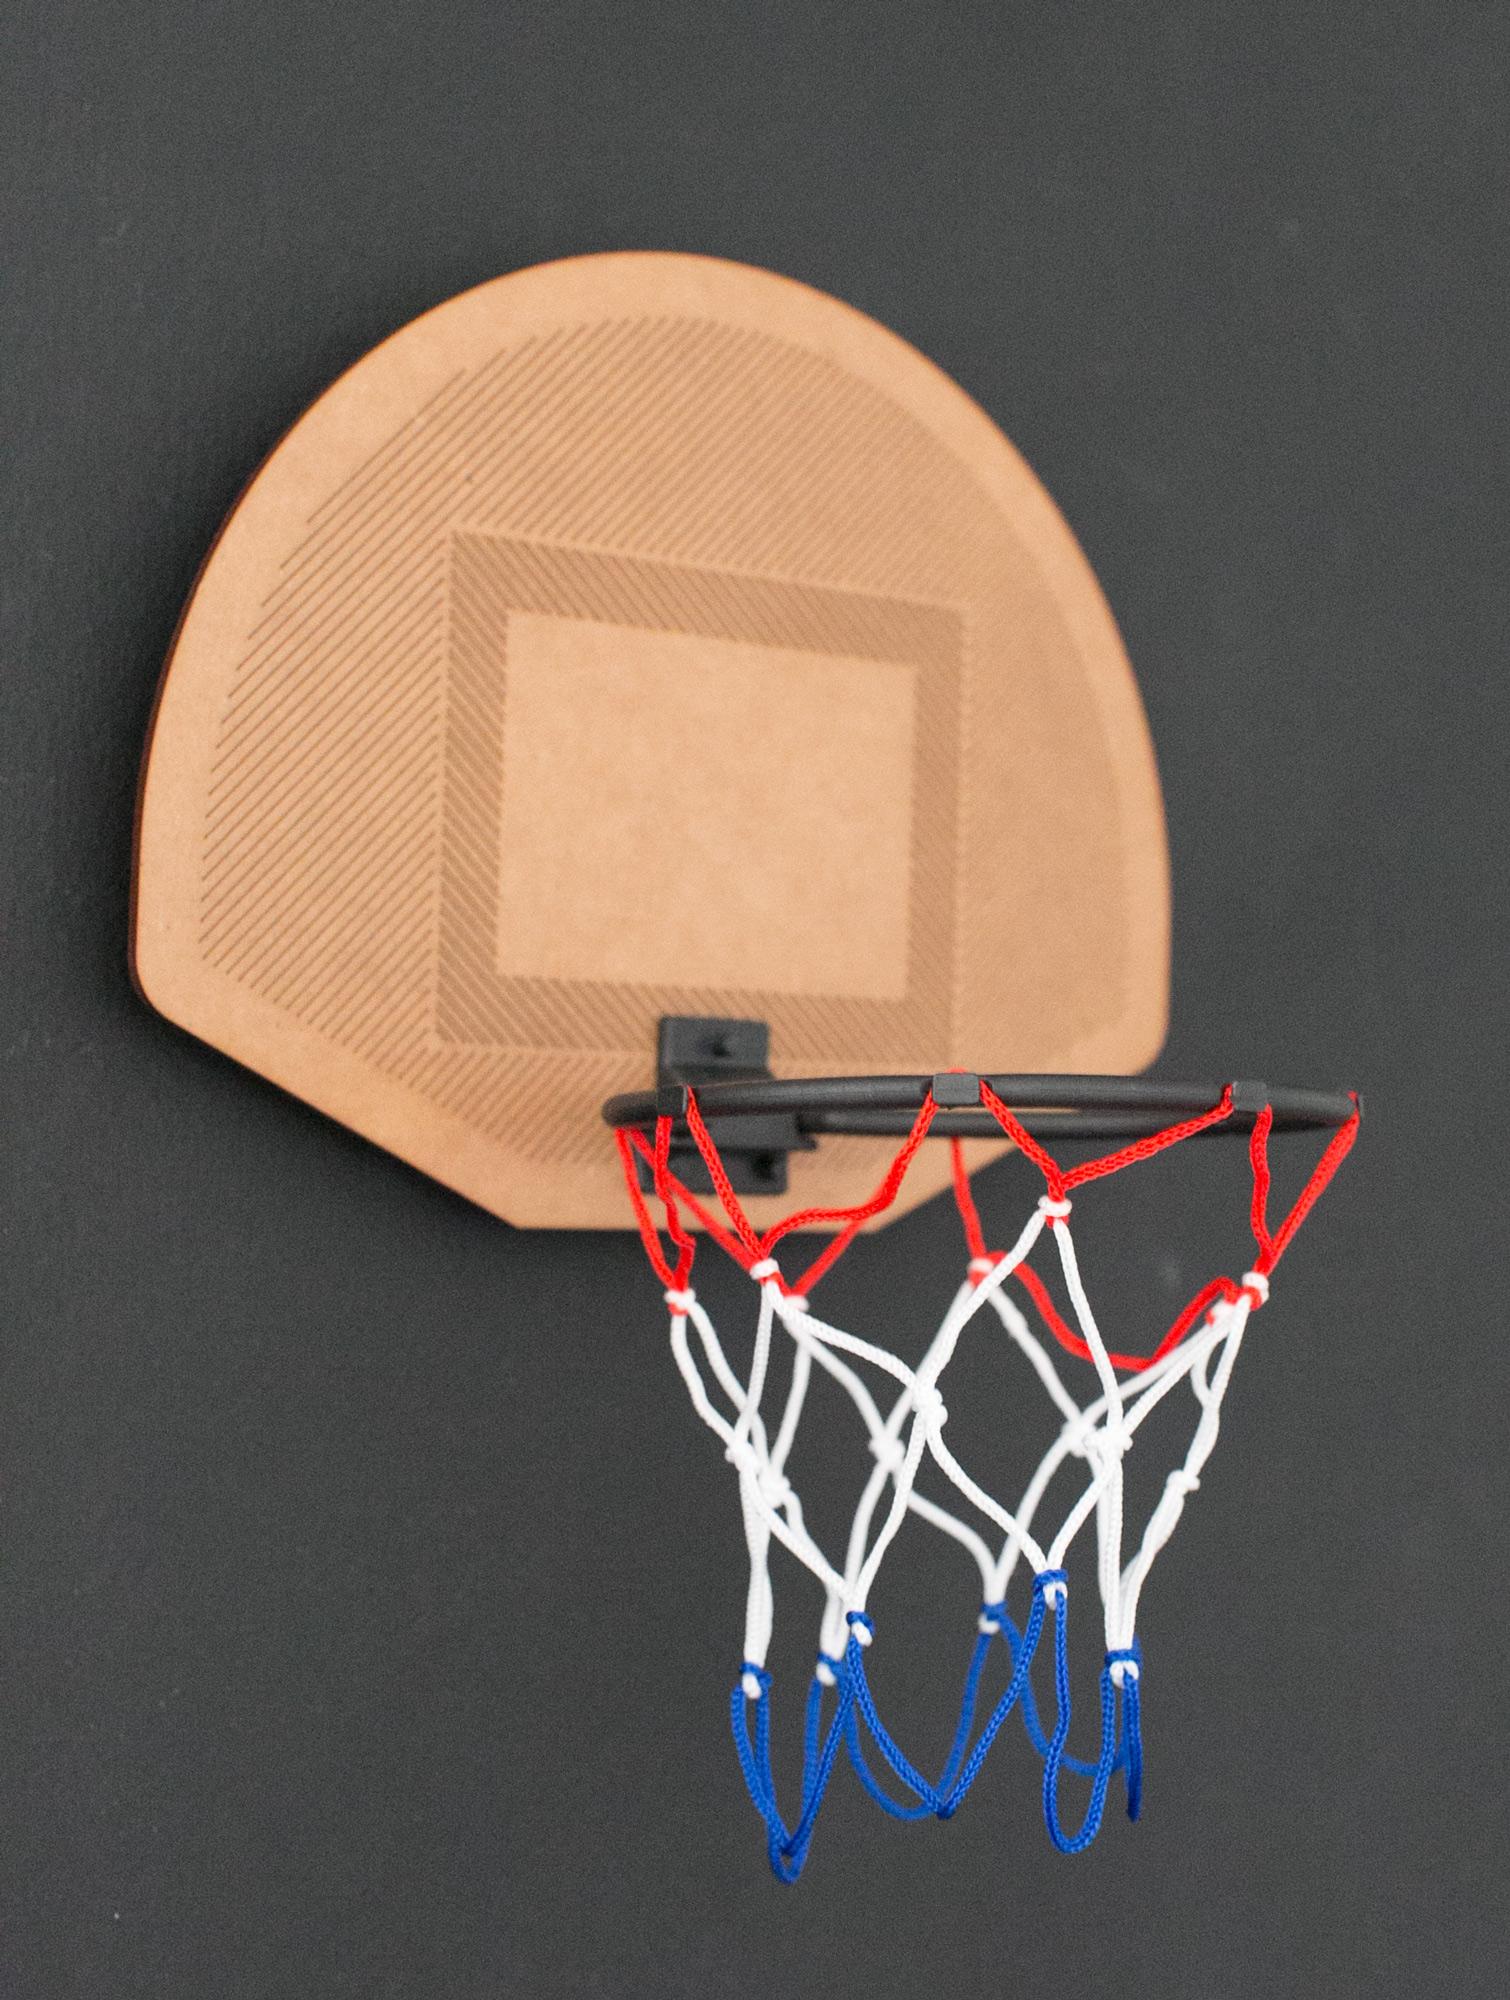 panier de basket o l d e d i. Black Bedroom Furniture Sets. Home Design Ideas